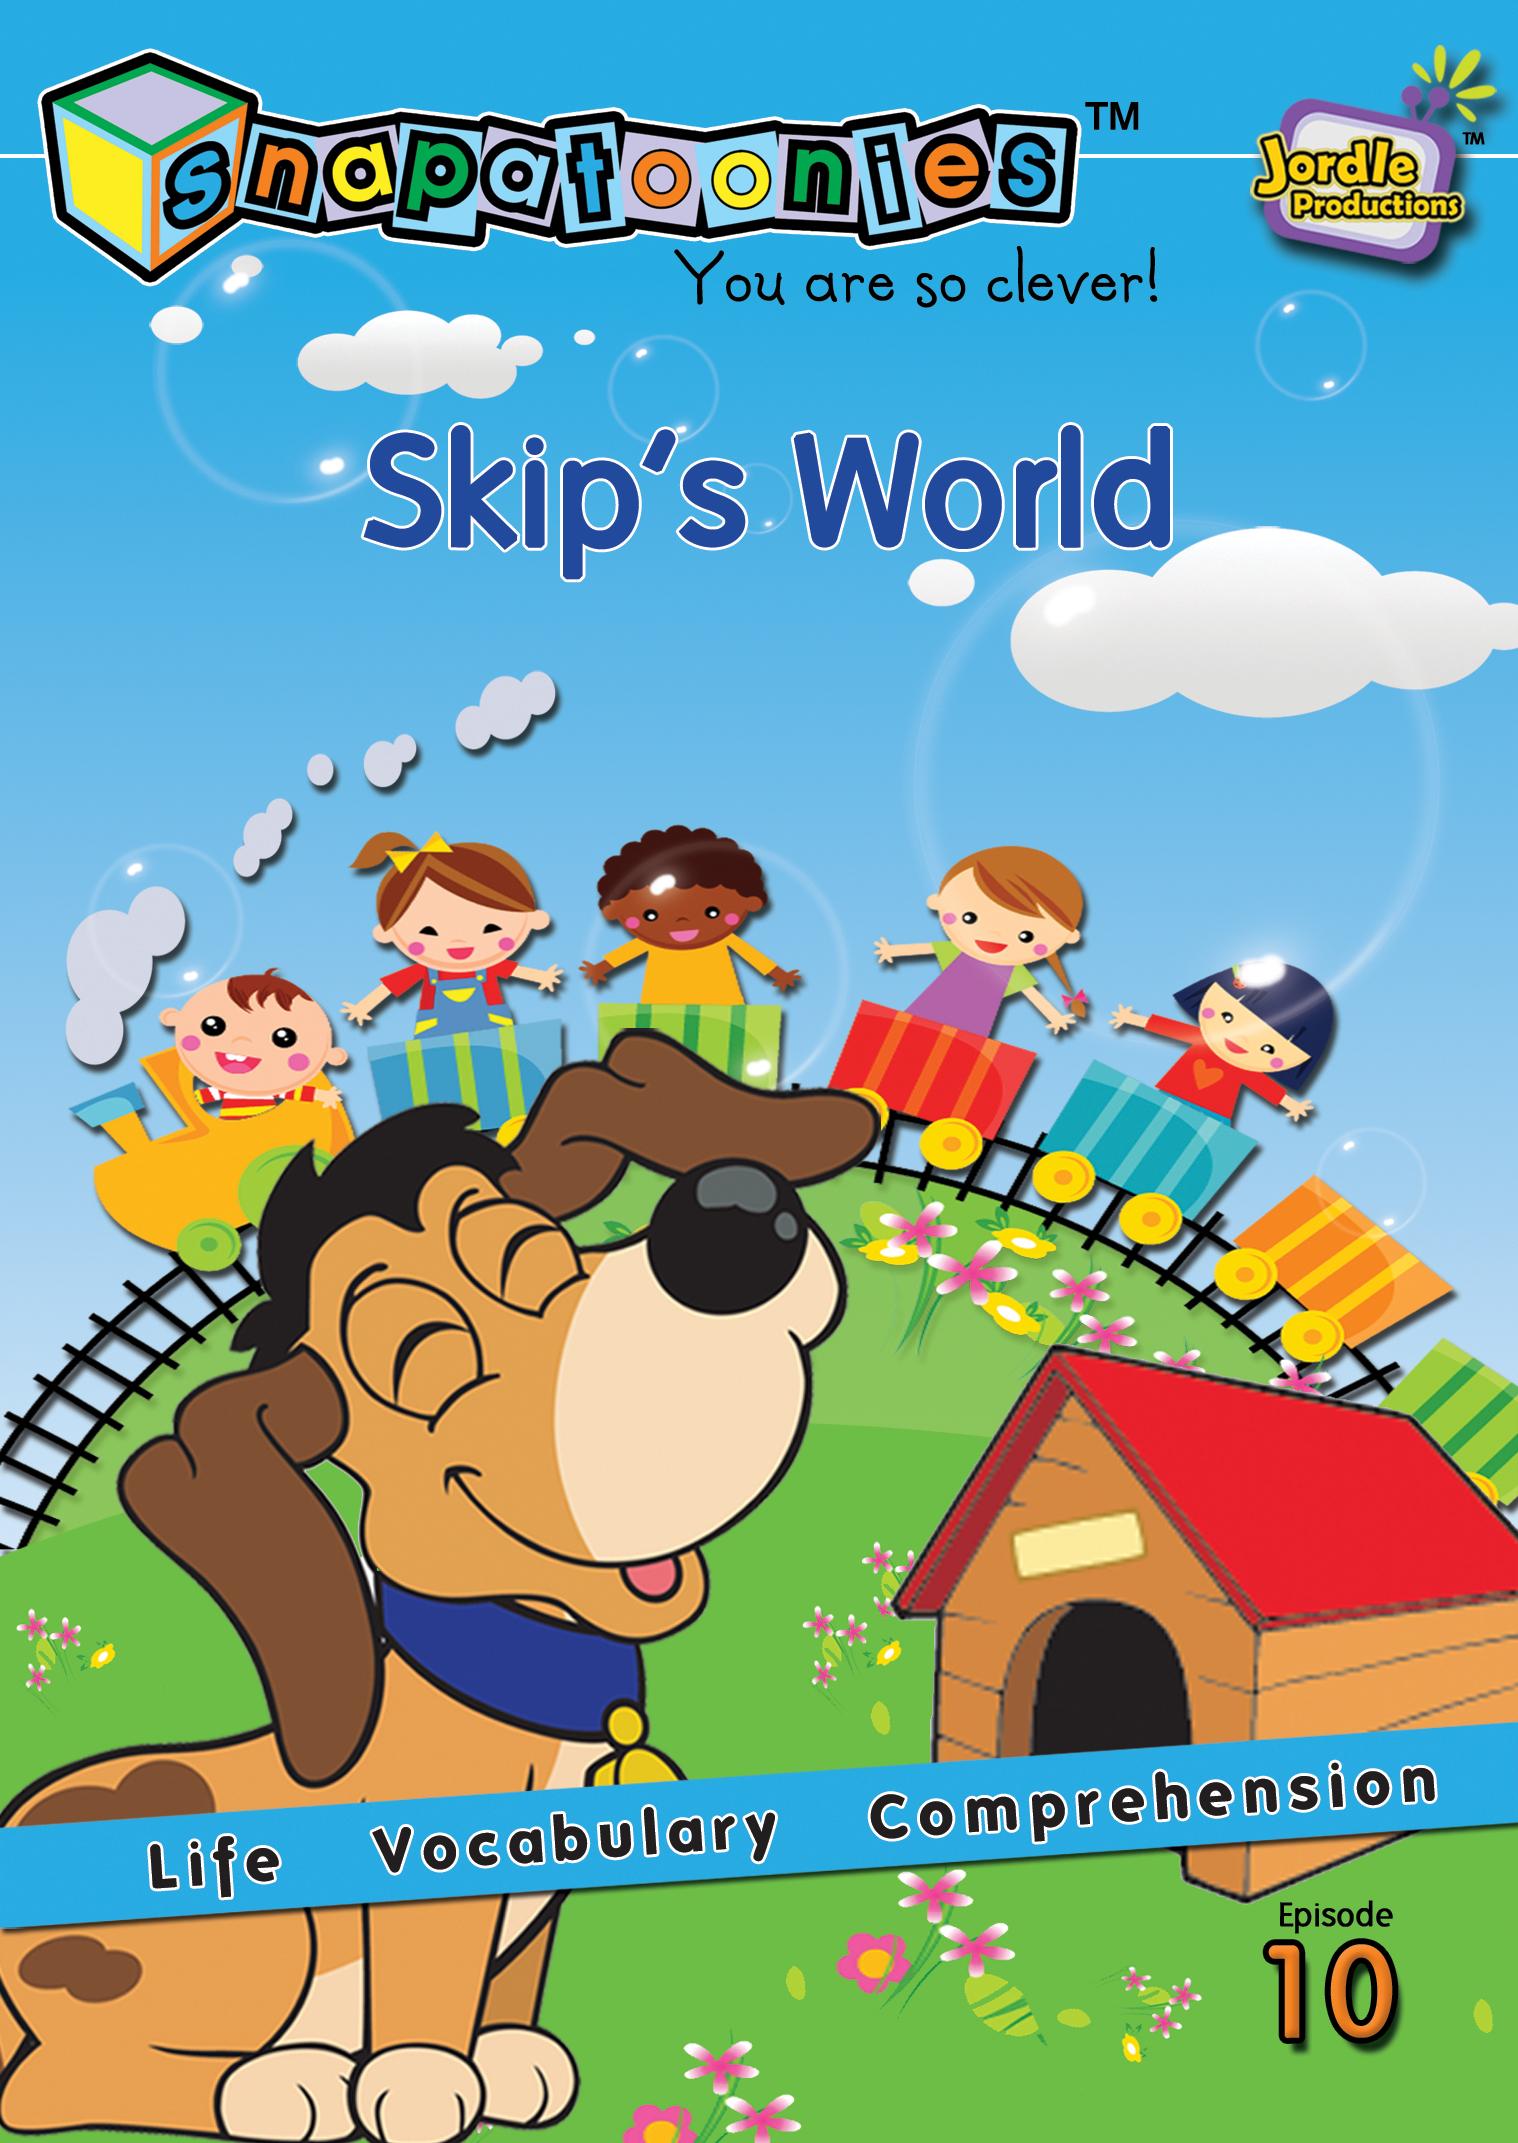 Snapatoonies Skip's World